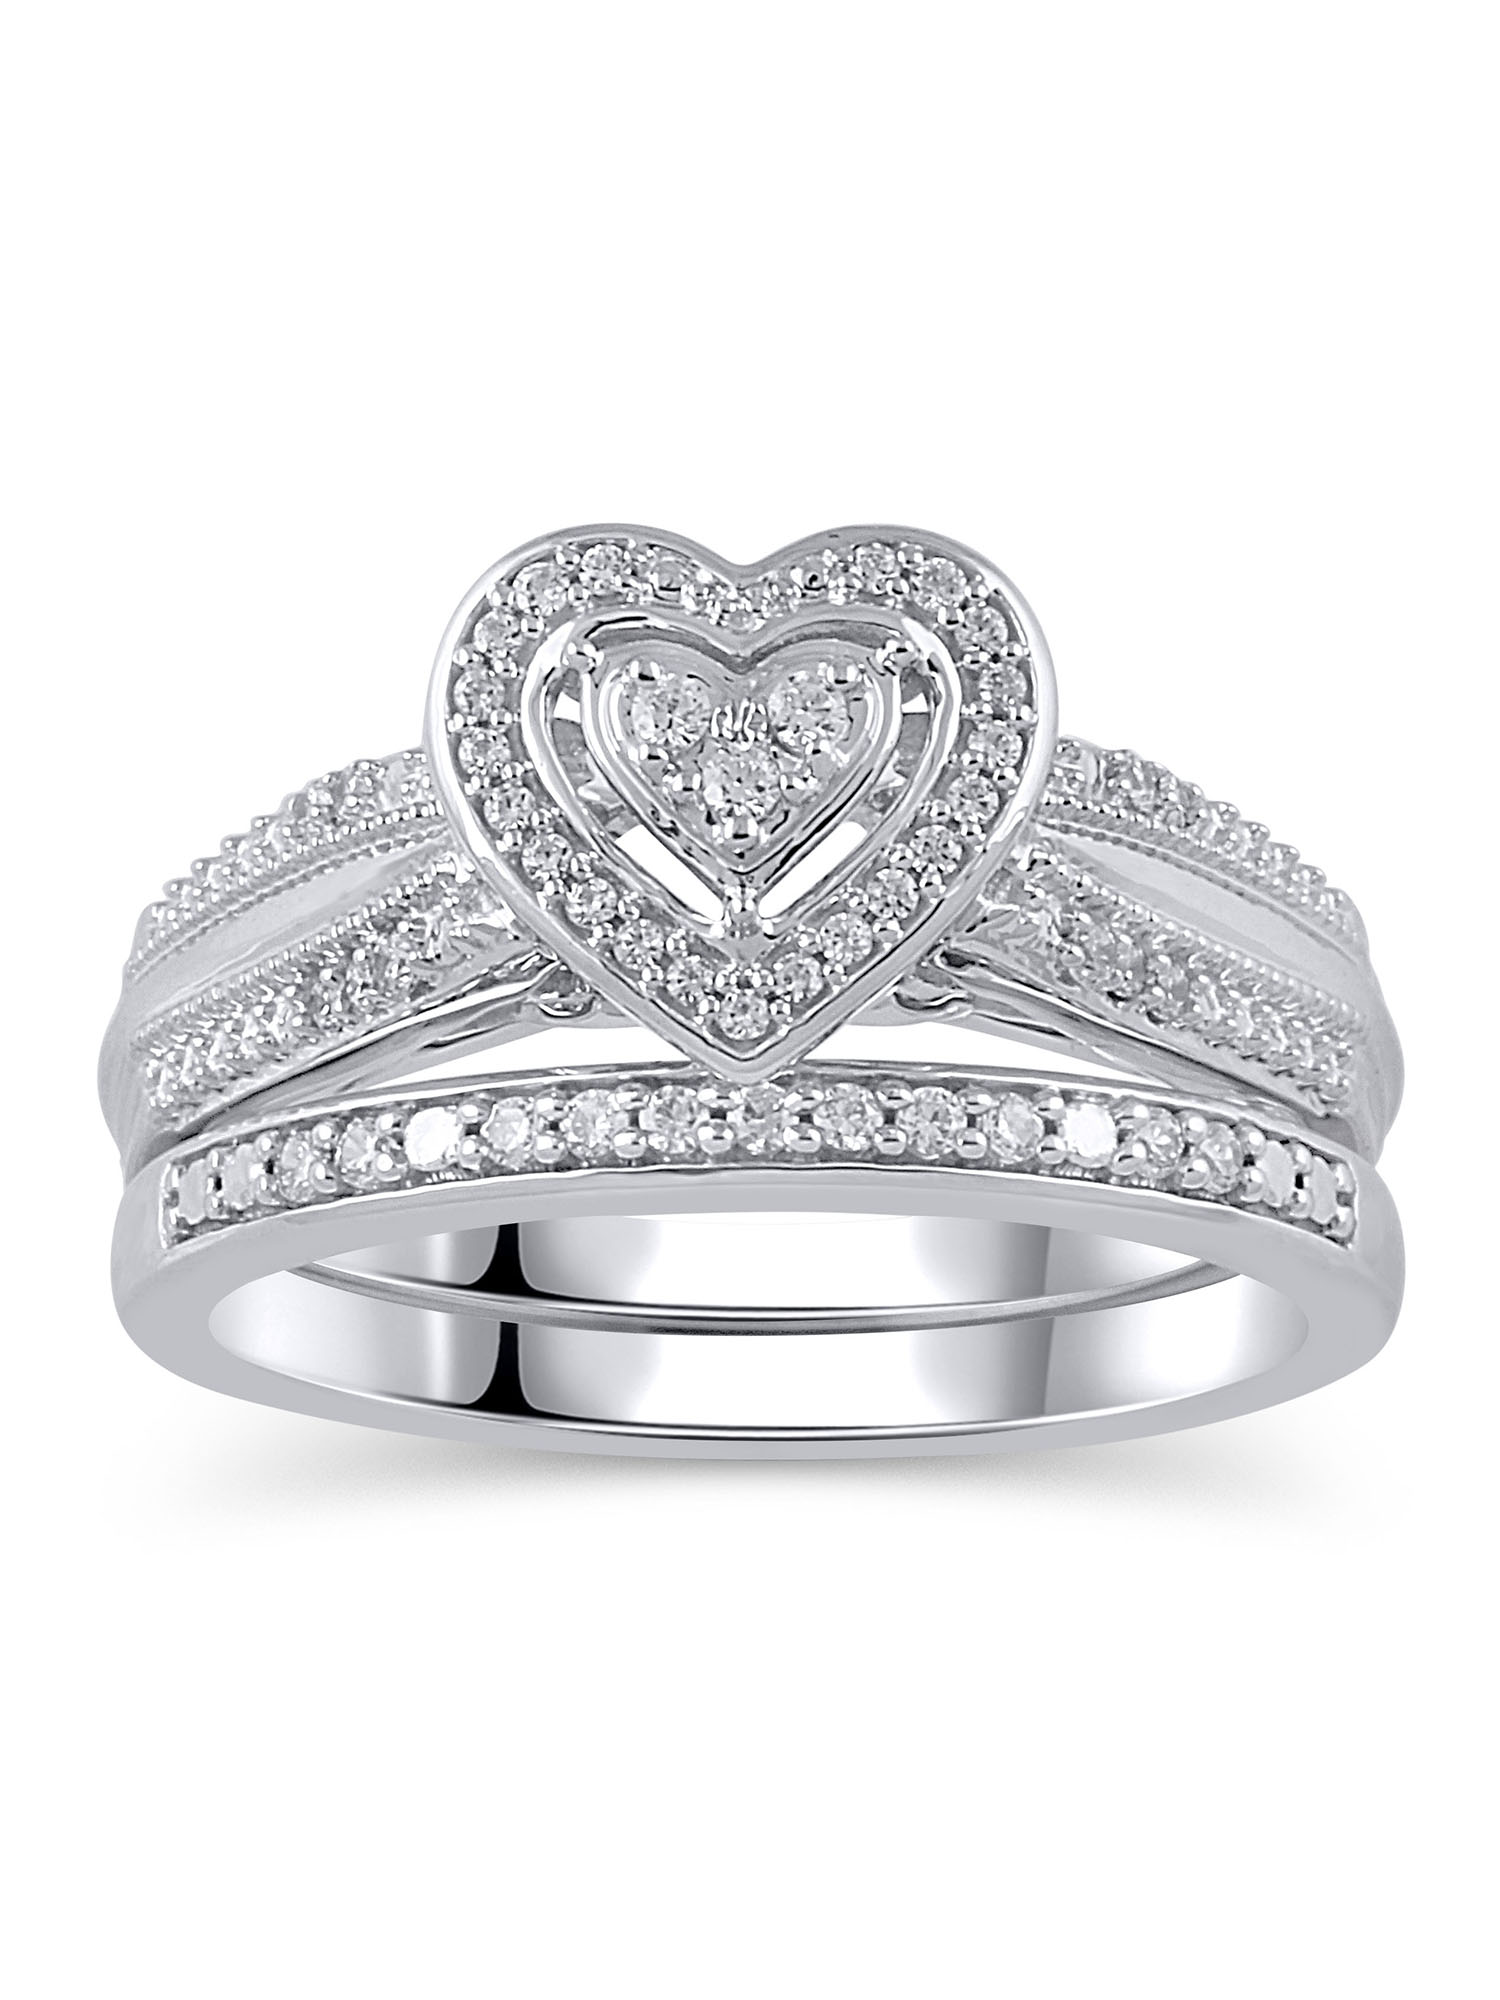 Forever Bride Wedding Ring Sets Walmartcom